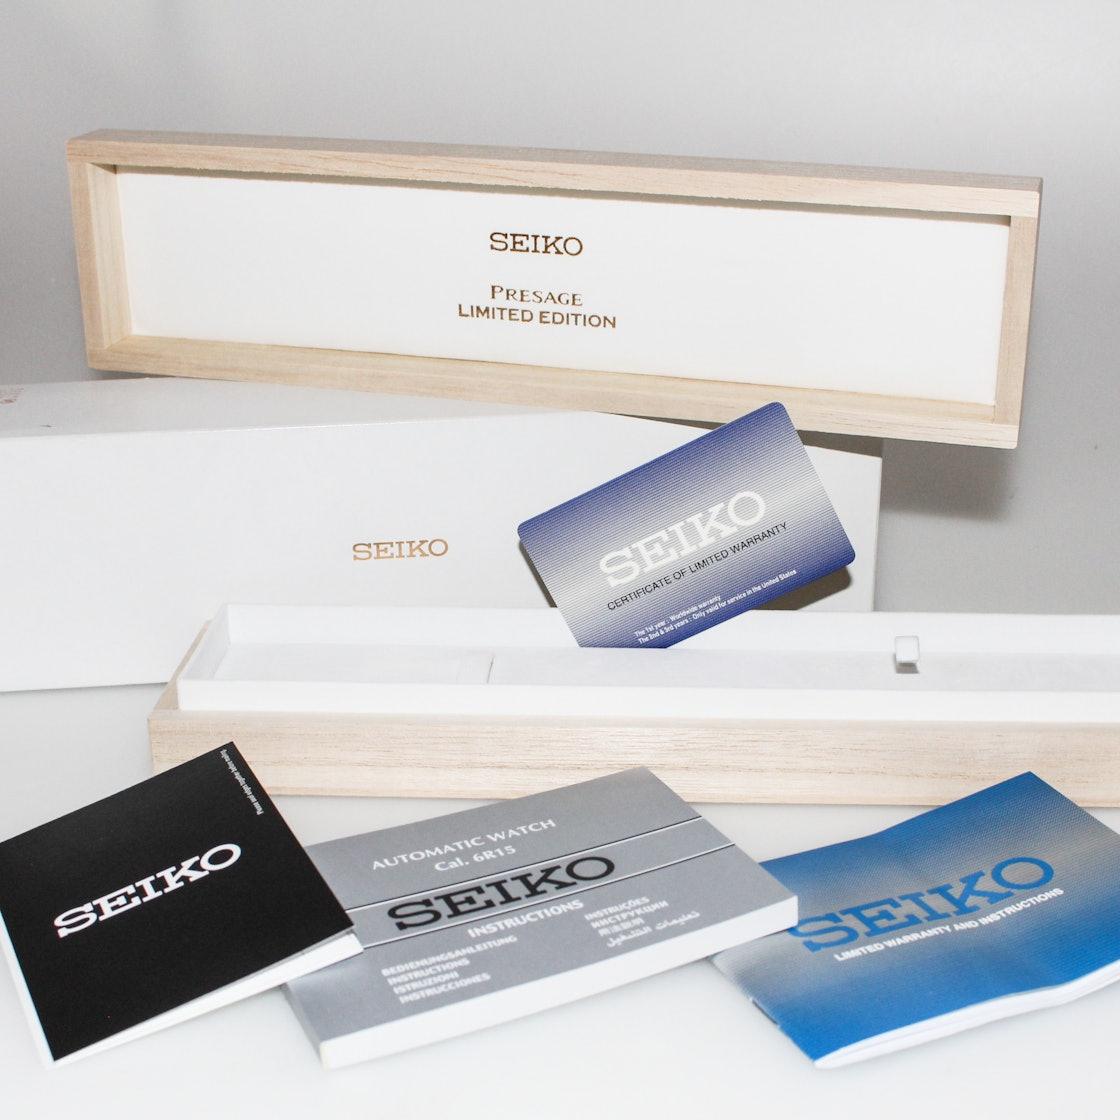 Seiko Presage Limited Edition SPB069